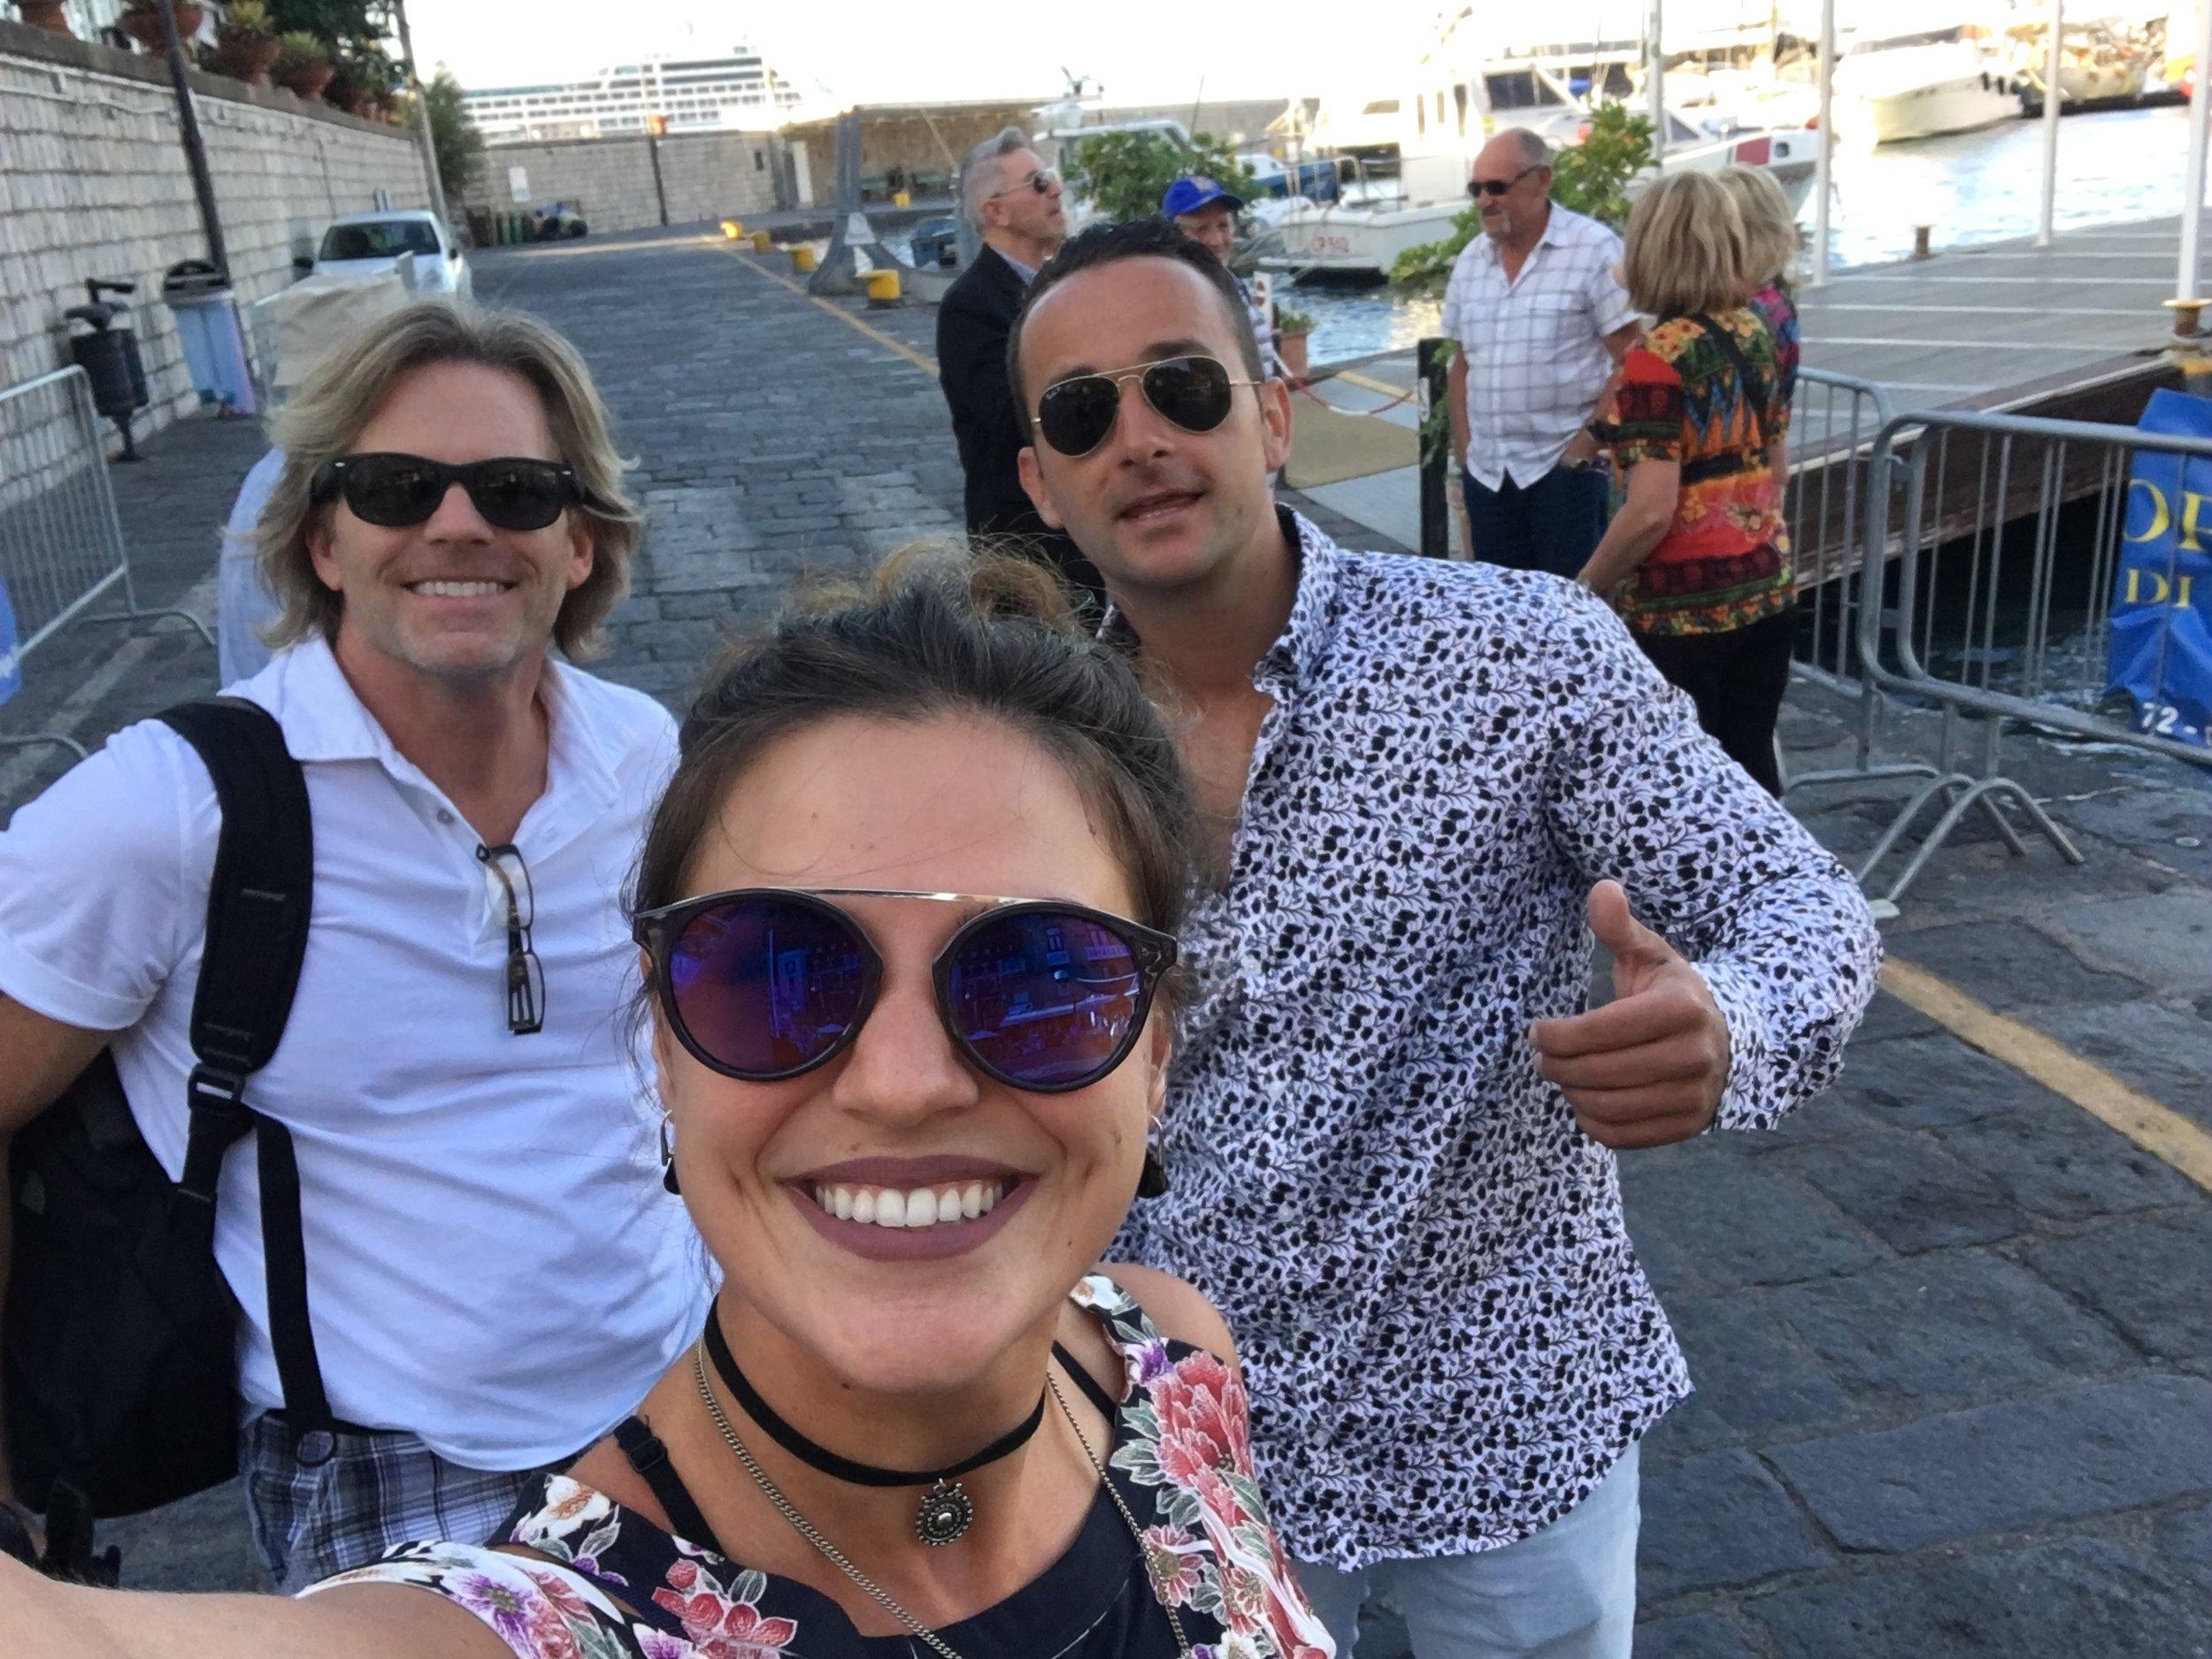 ARTWAVE SQUAD! Love you guys. Sorrento,  Italy